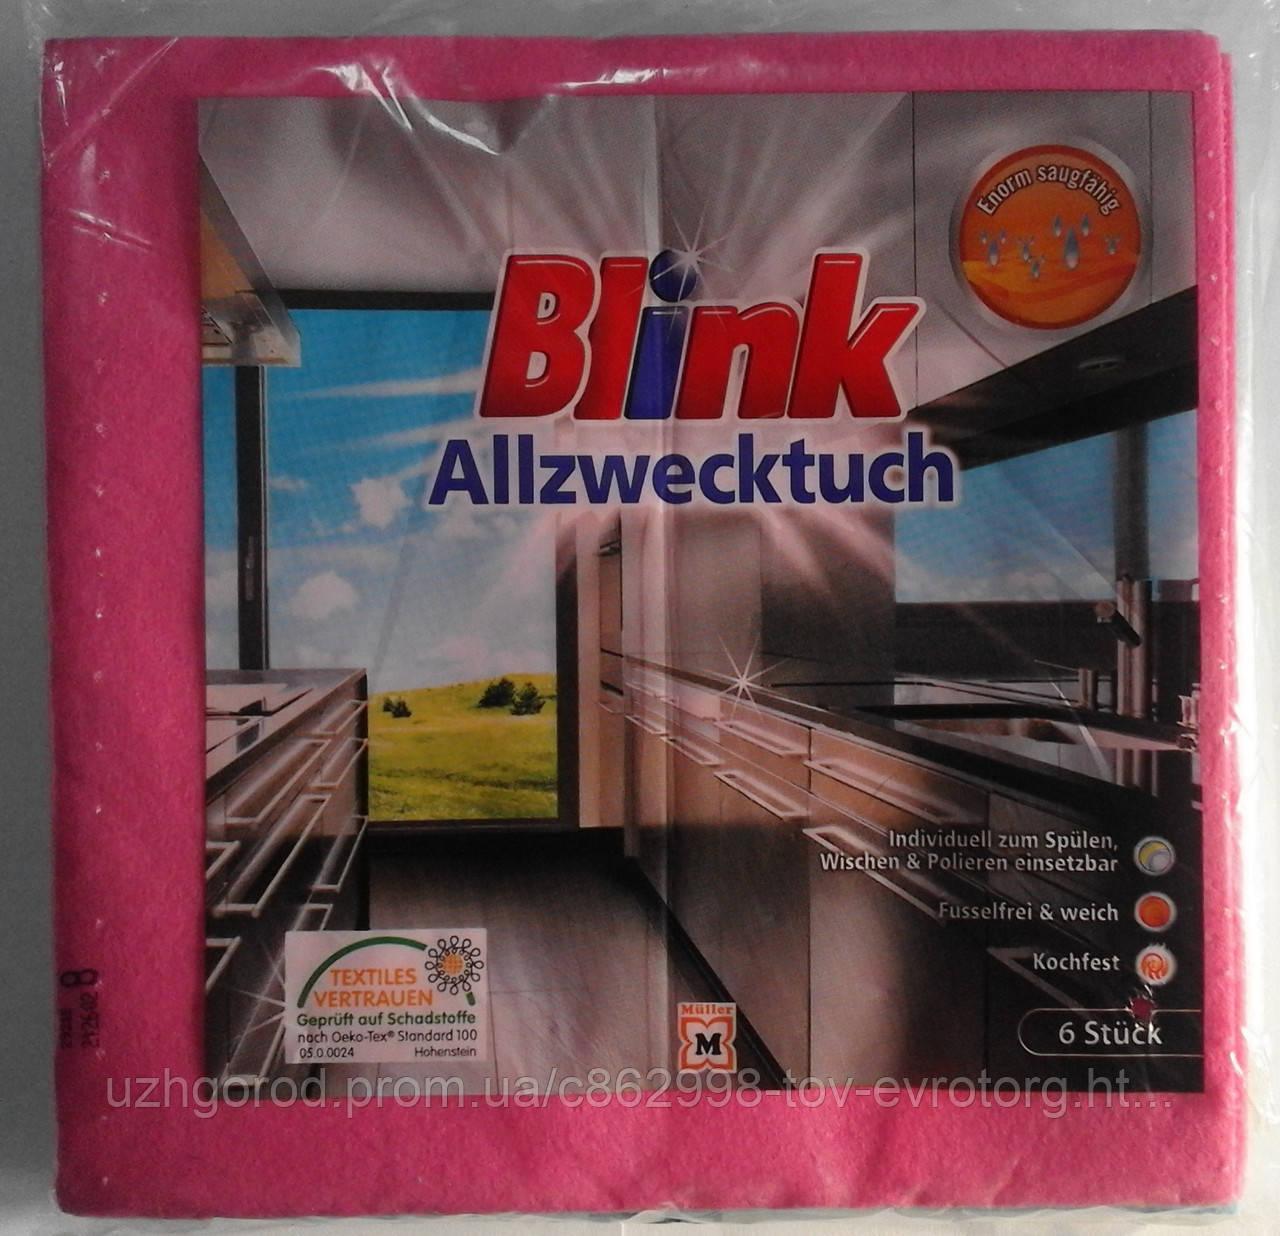 Матерчатие салфетки для дома Blink allzwecktuch 6 шт